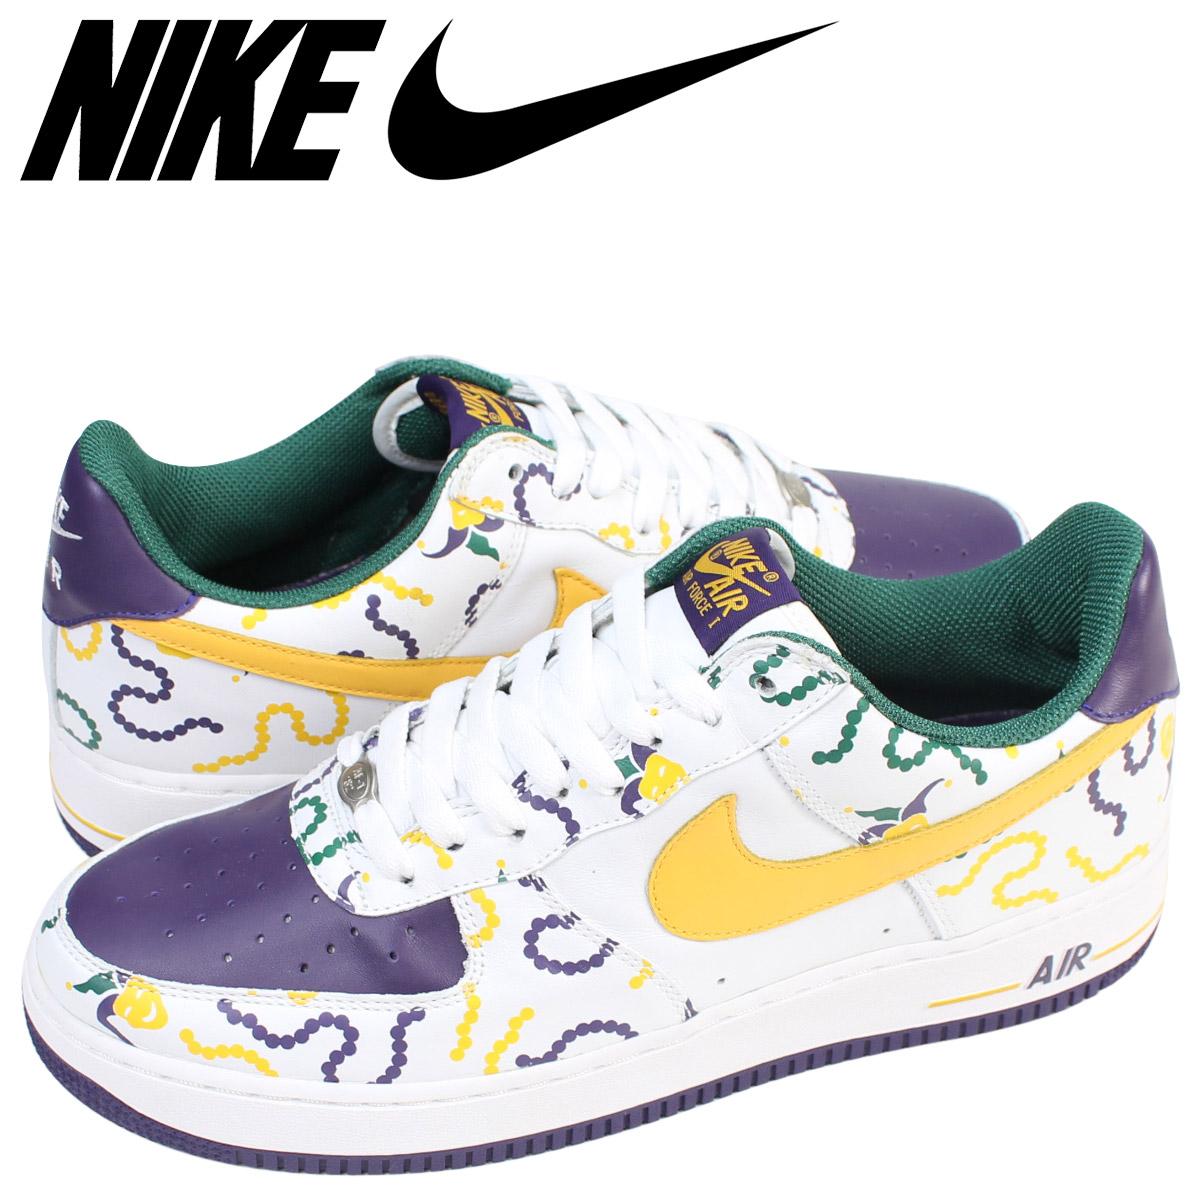 Cheap Nike Sneakers Air Force 1 Low SE,Nike Men's,White